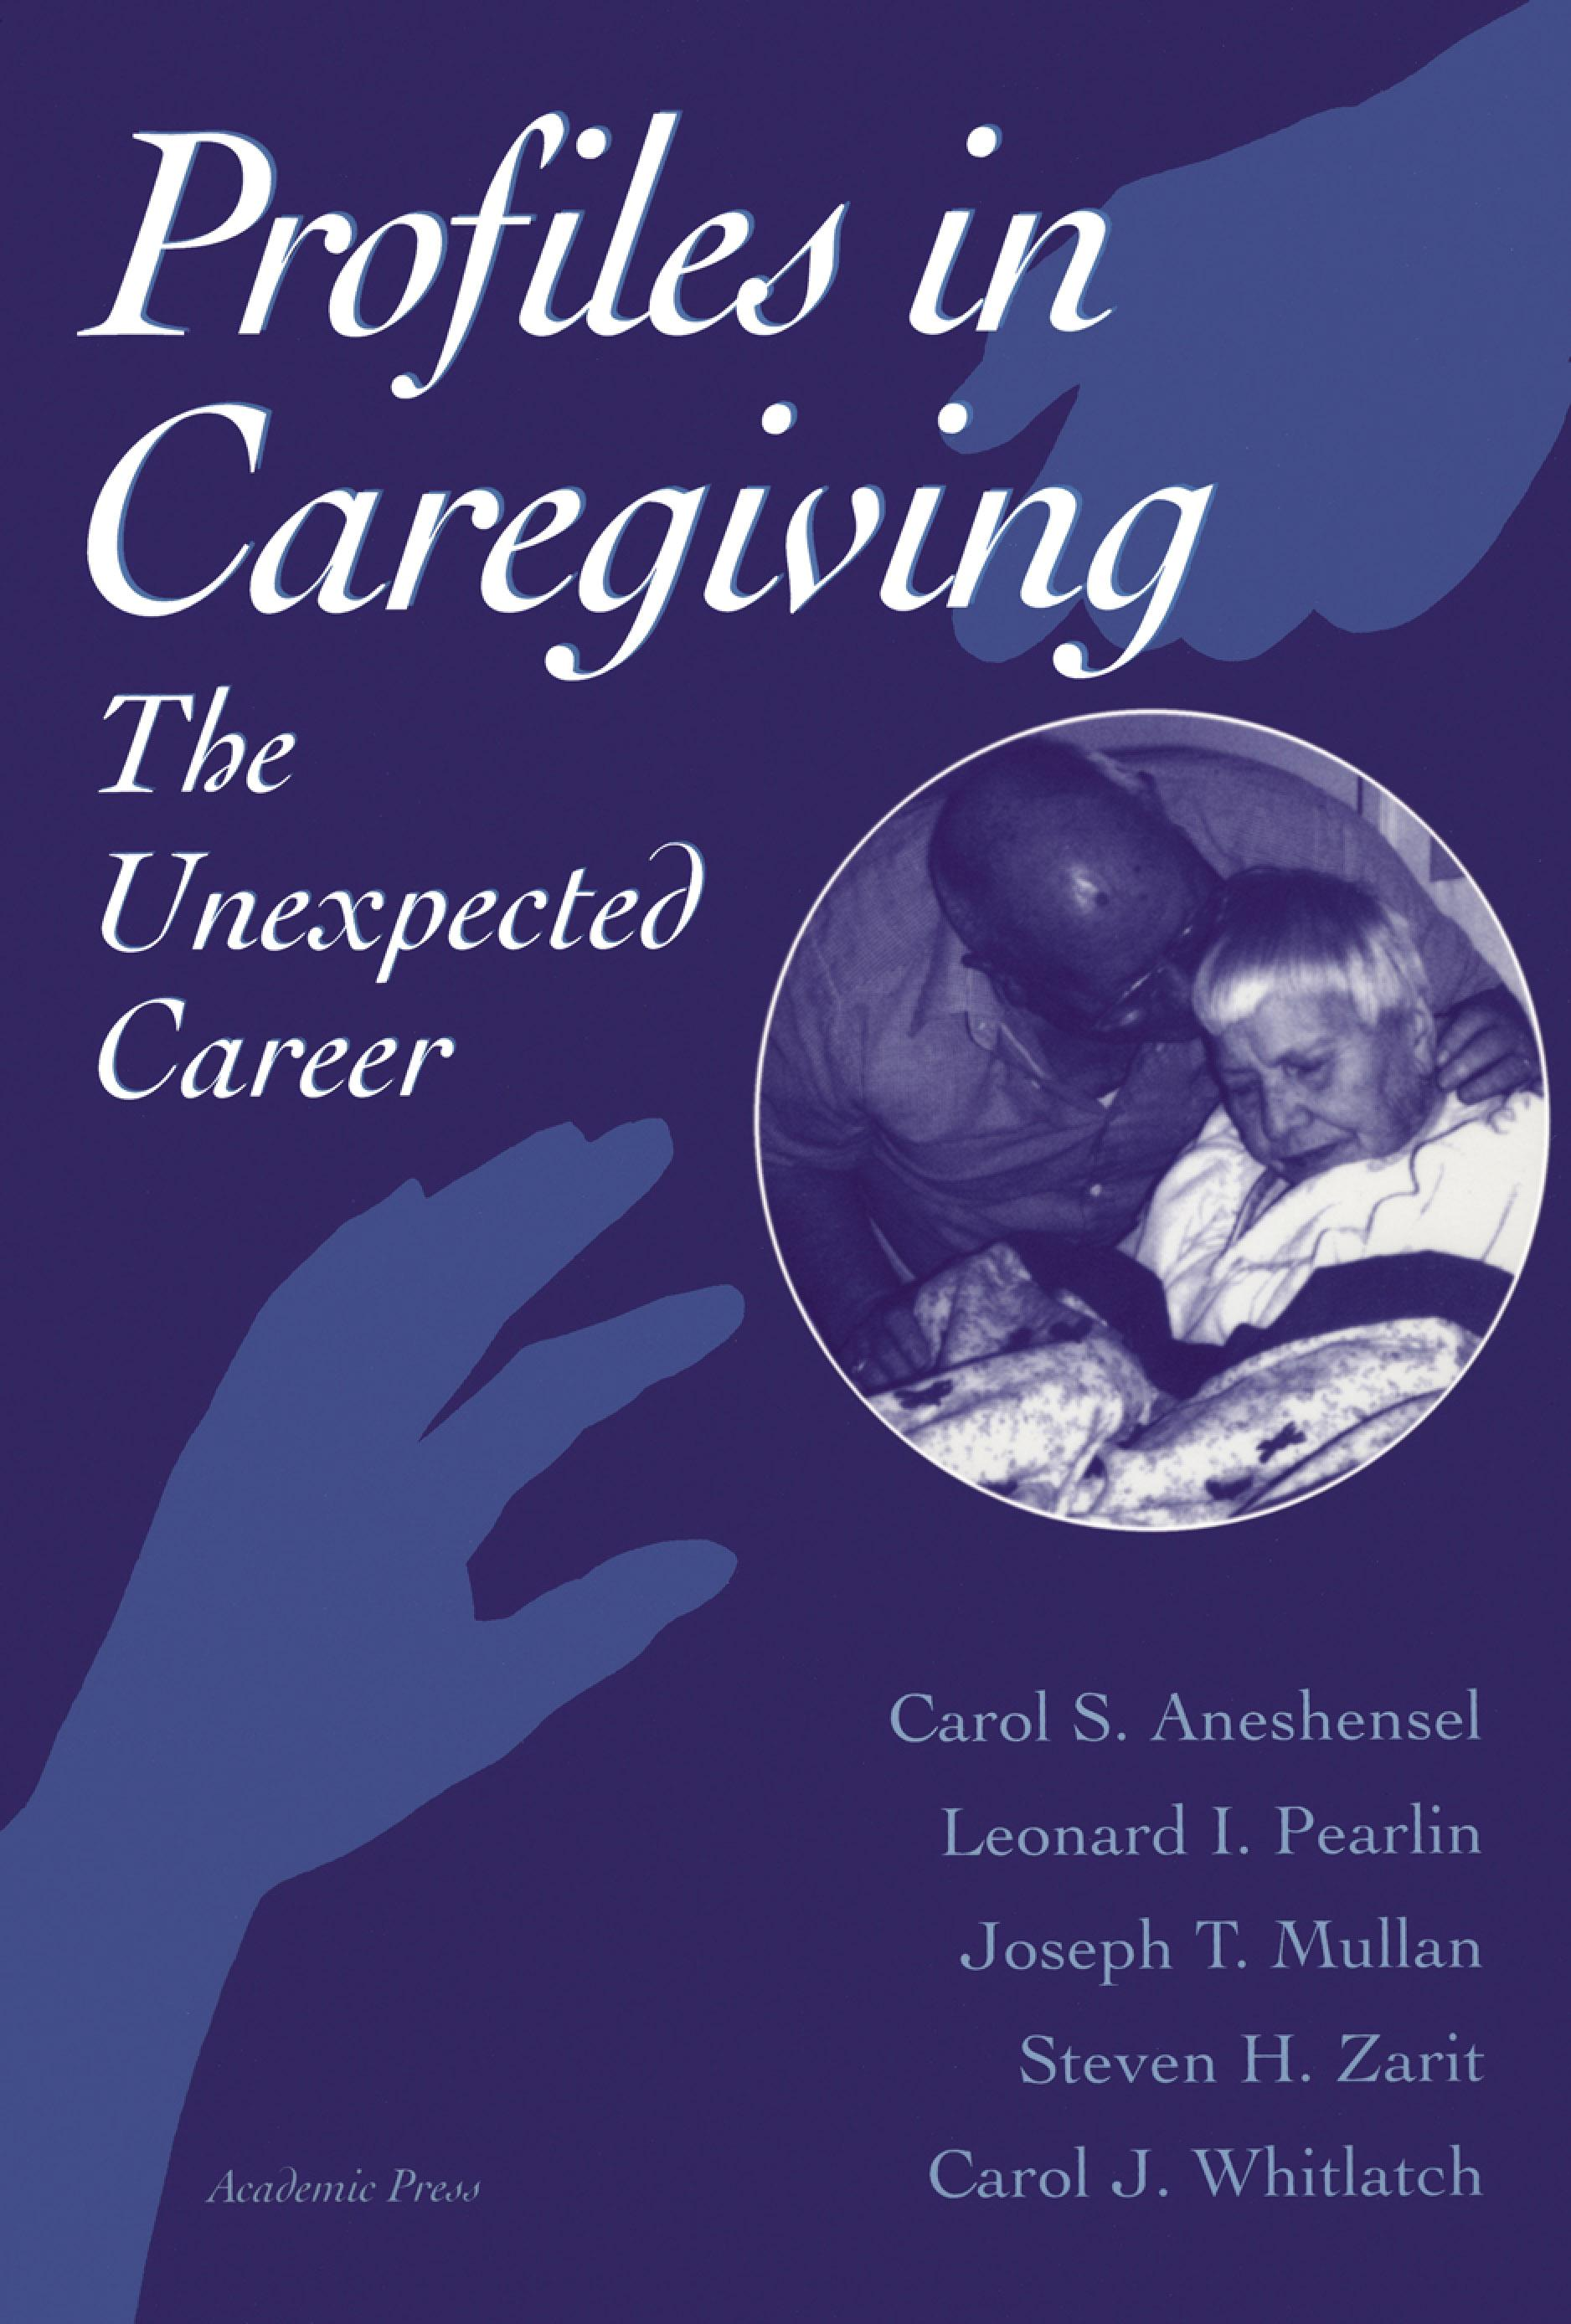 Profiles in Caregiving: The Unexpected Career